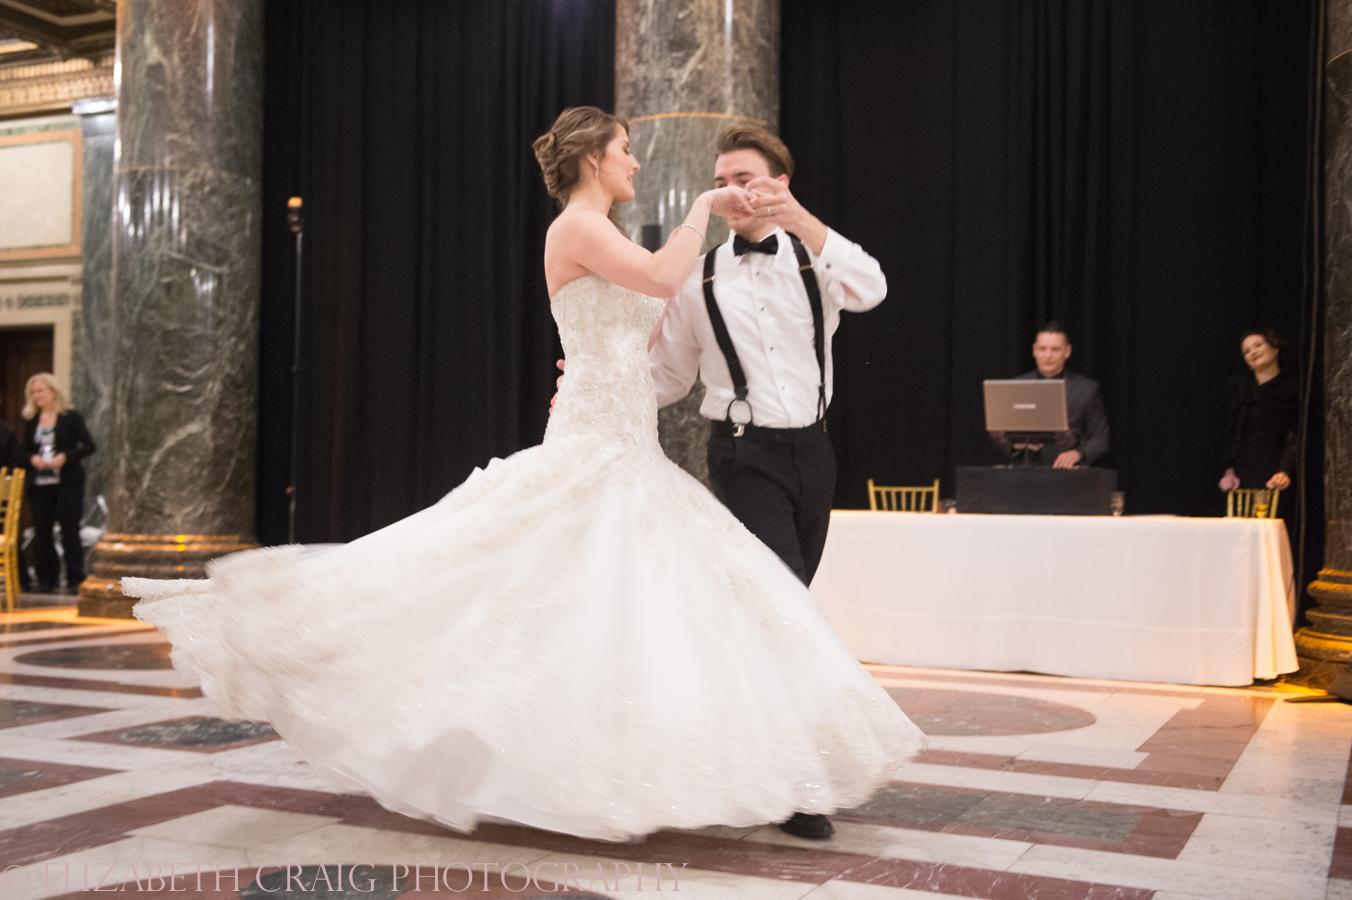 Carnegie Museum of Art Weddings | Elizabeth Craig Photography-0103